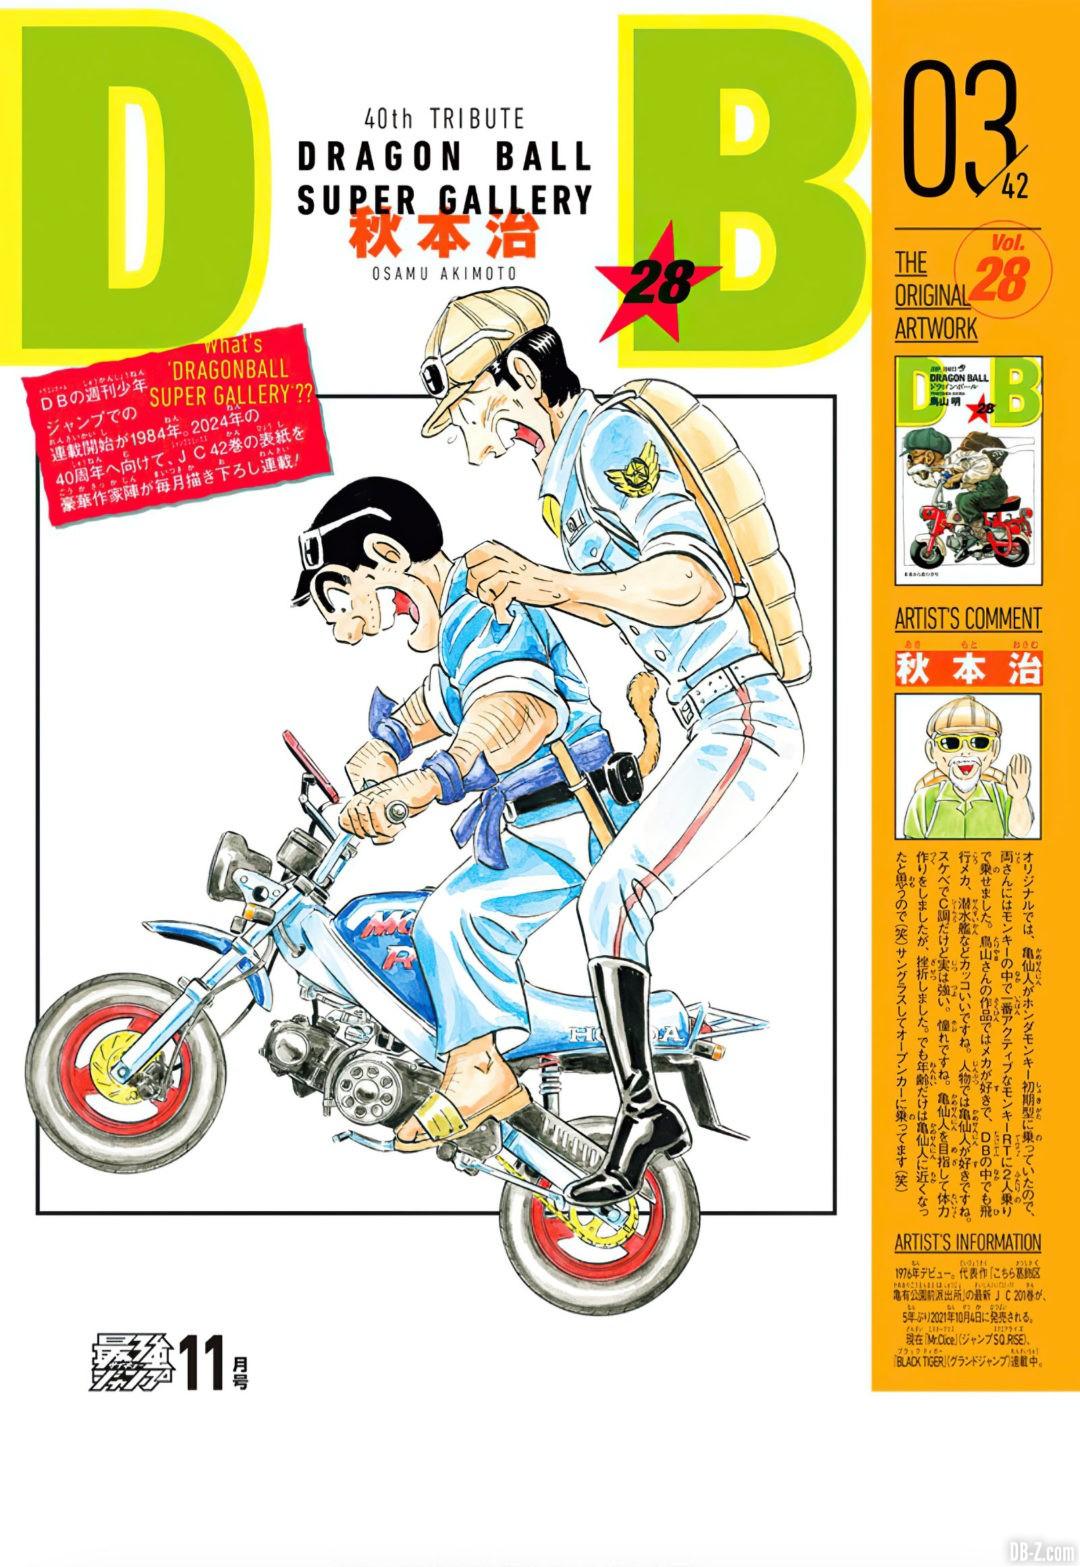 dragon ball super gallery 03